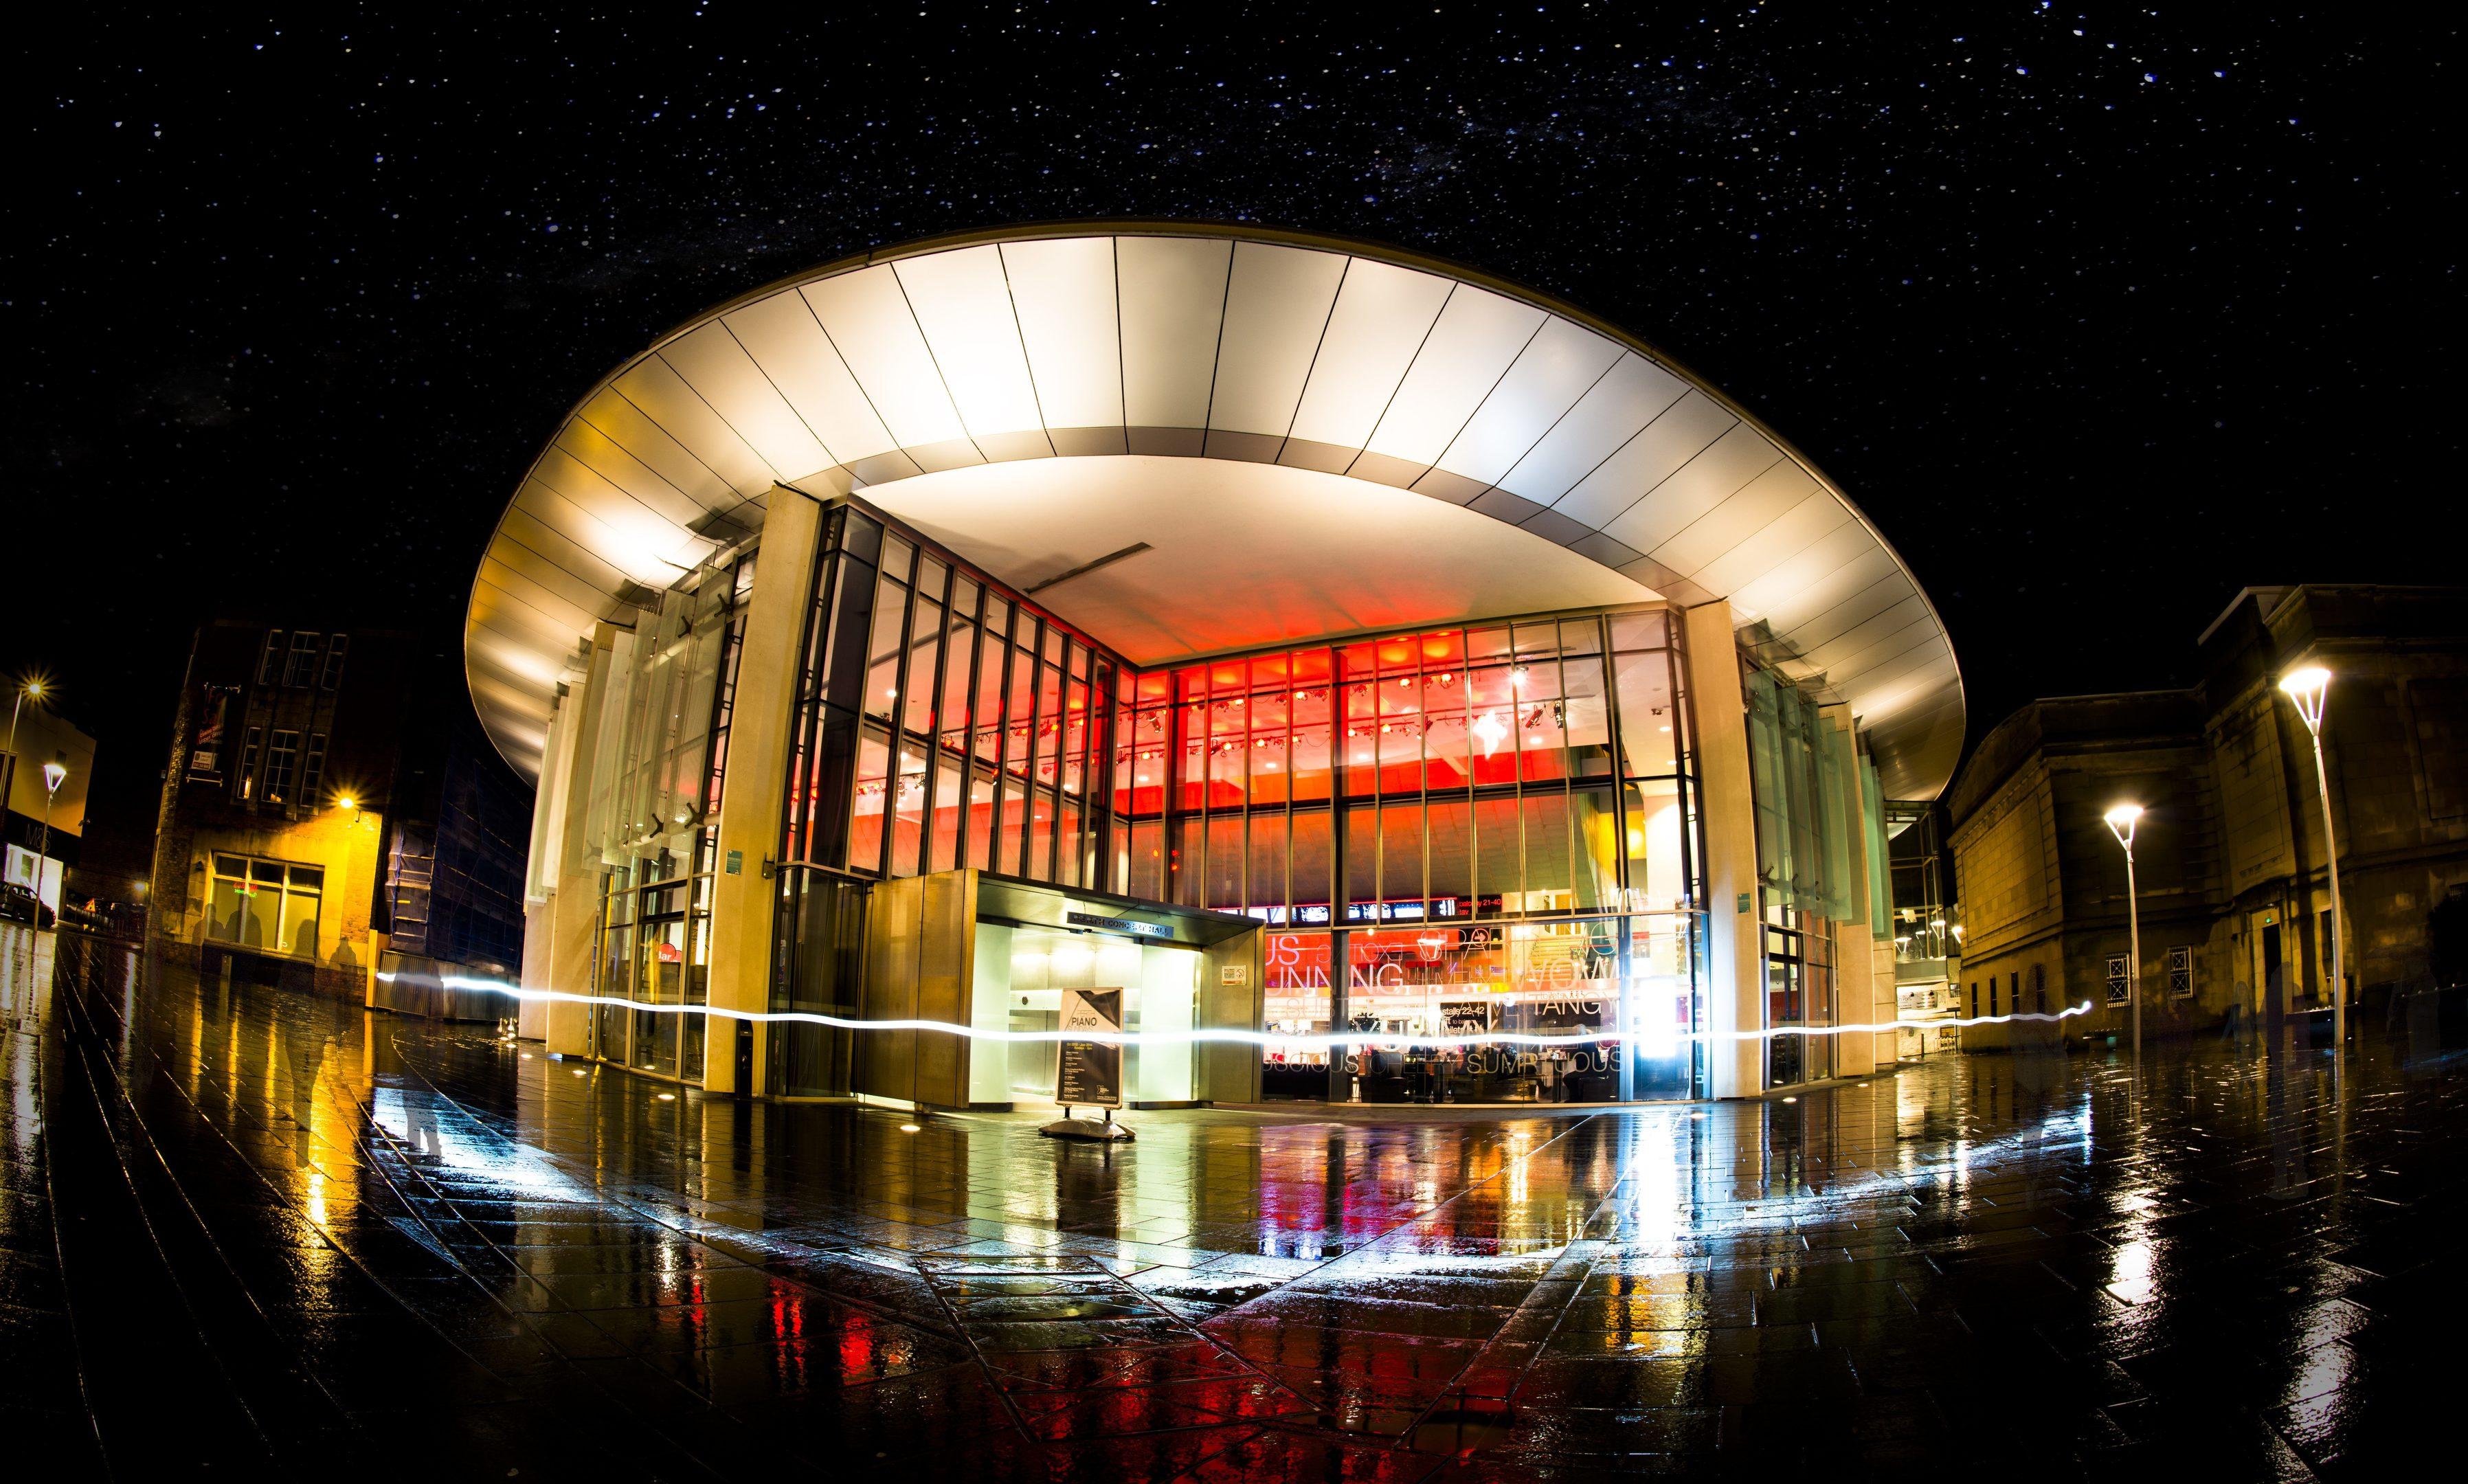 Perth Concert Hall at night